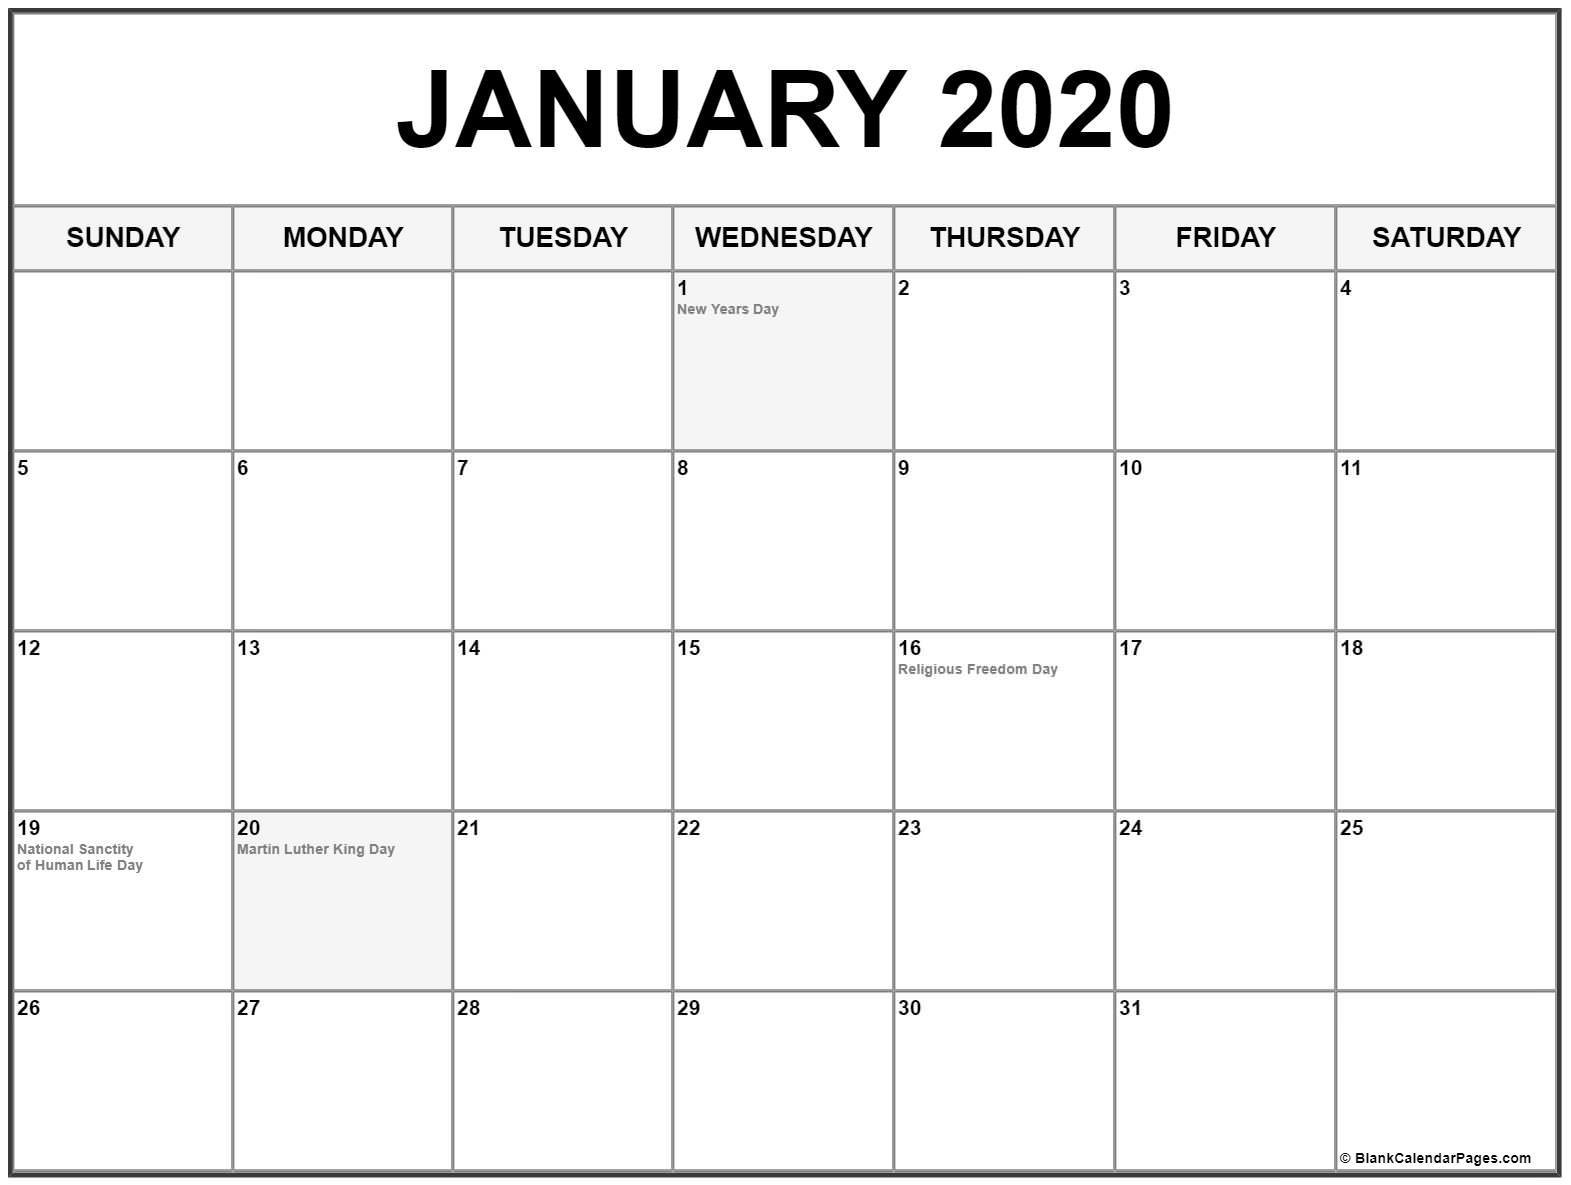 Impressive Calendar With Holidays 2020 • Printable Blank-Calendar Of Jewish Holidays 2020